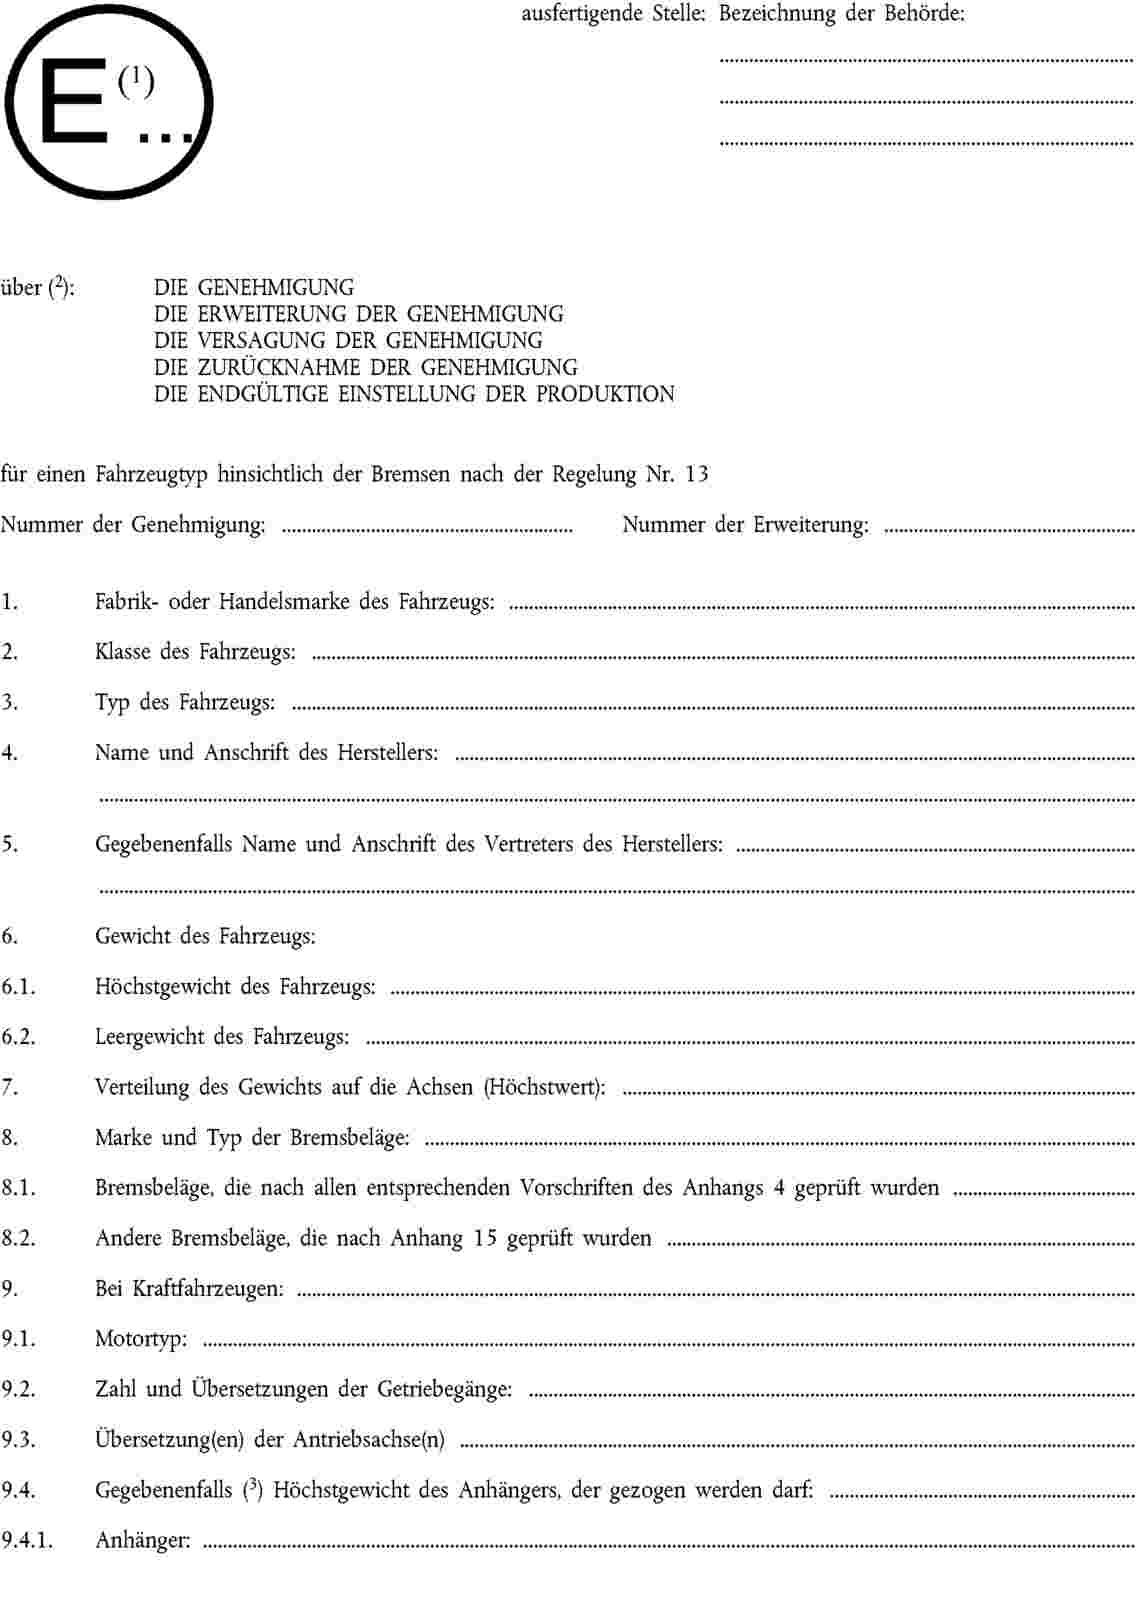 Großzügig 7 Wege Anhängerkabel Fotos - Elektrische Schaltplan-Ideen ...